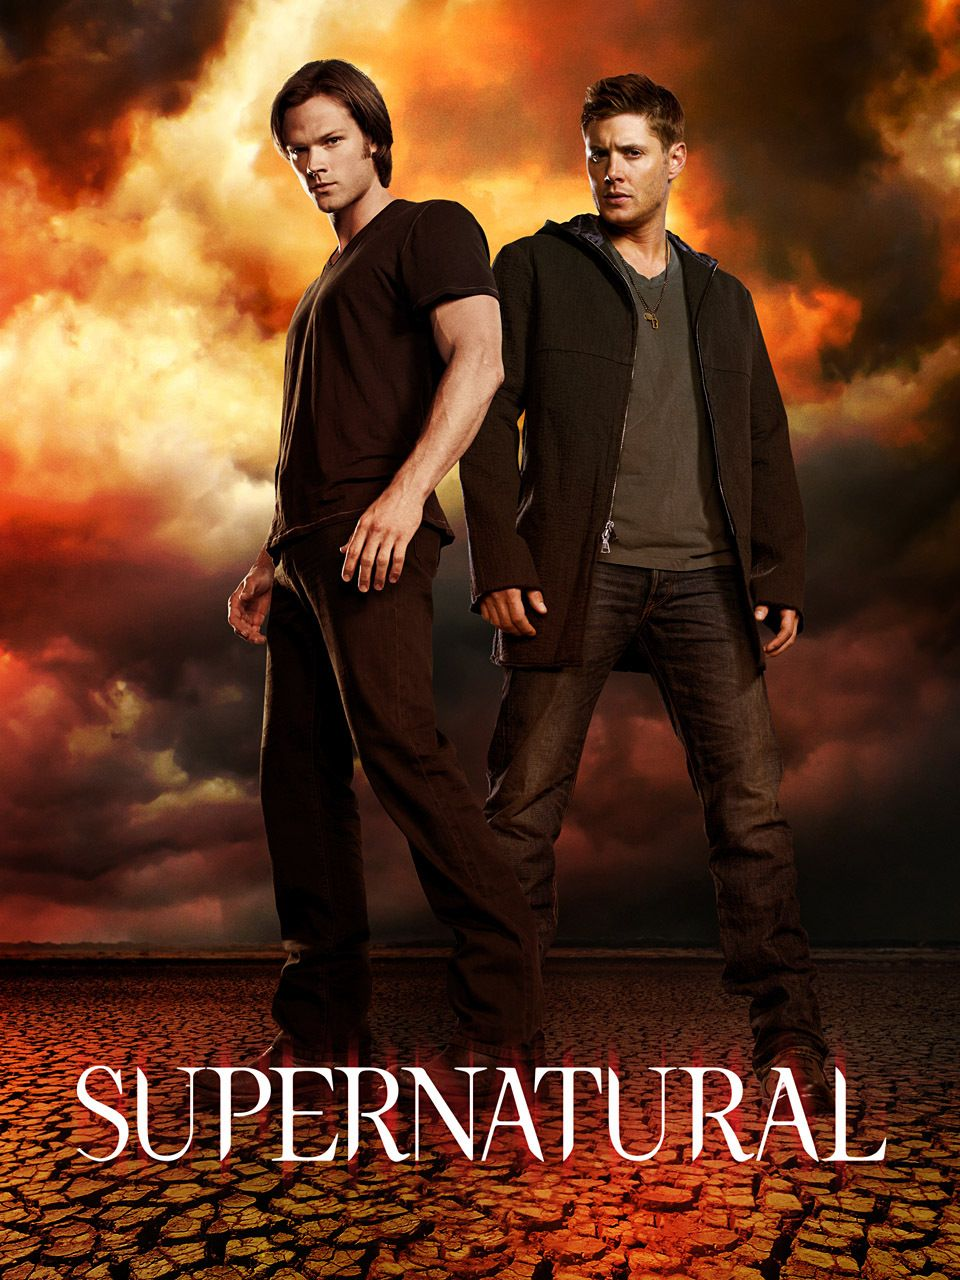 Poster Supernatural New Season 9 8 7 Room Club Art Wall Cloth Print  246